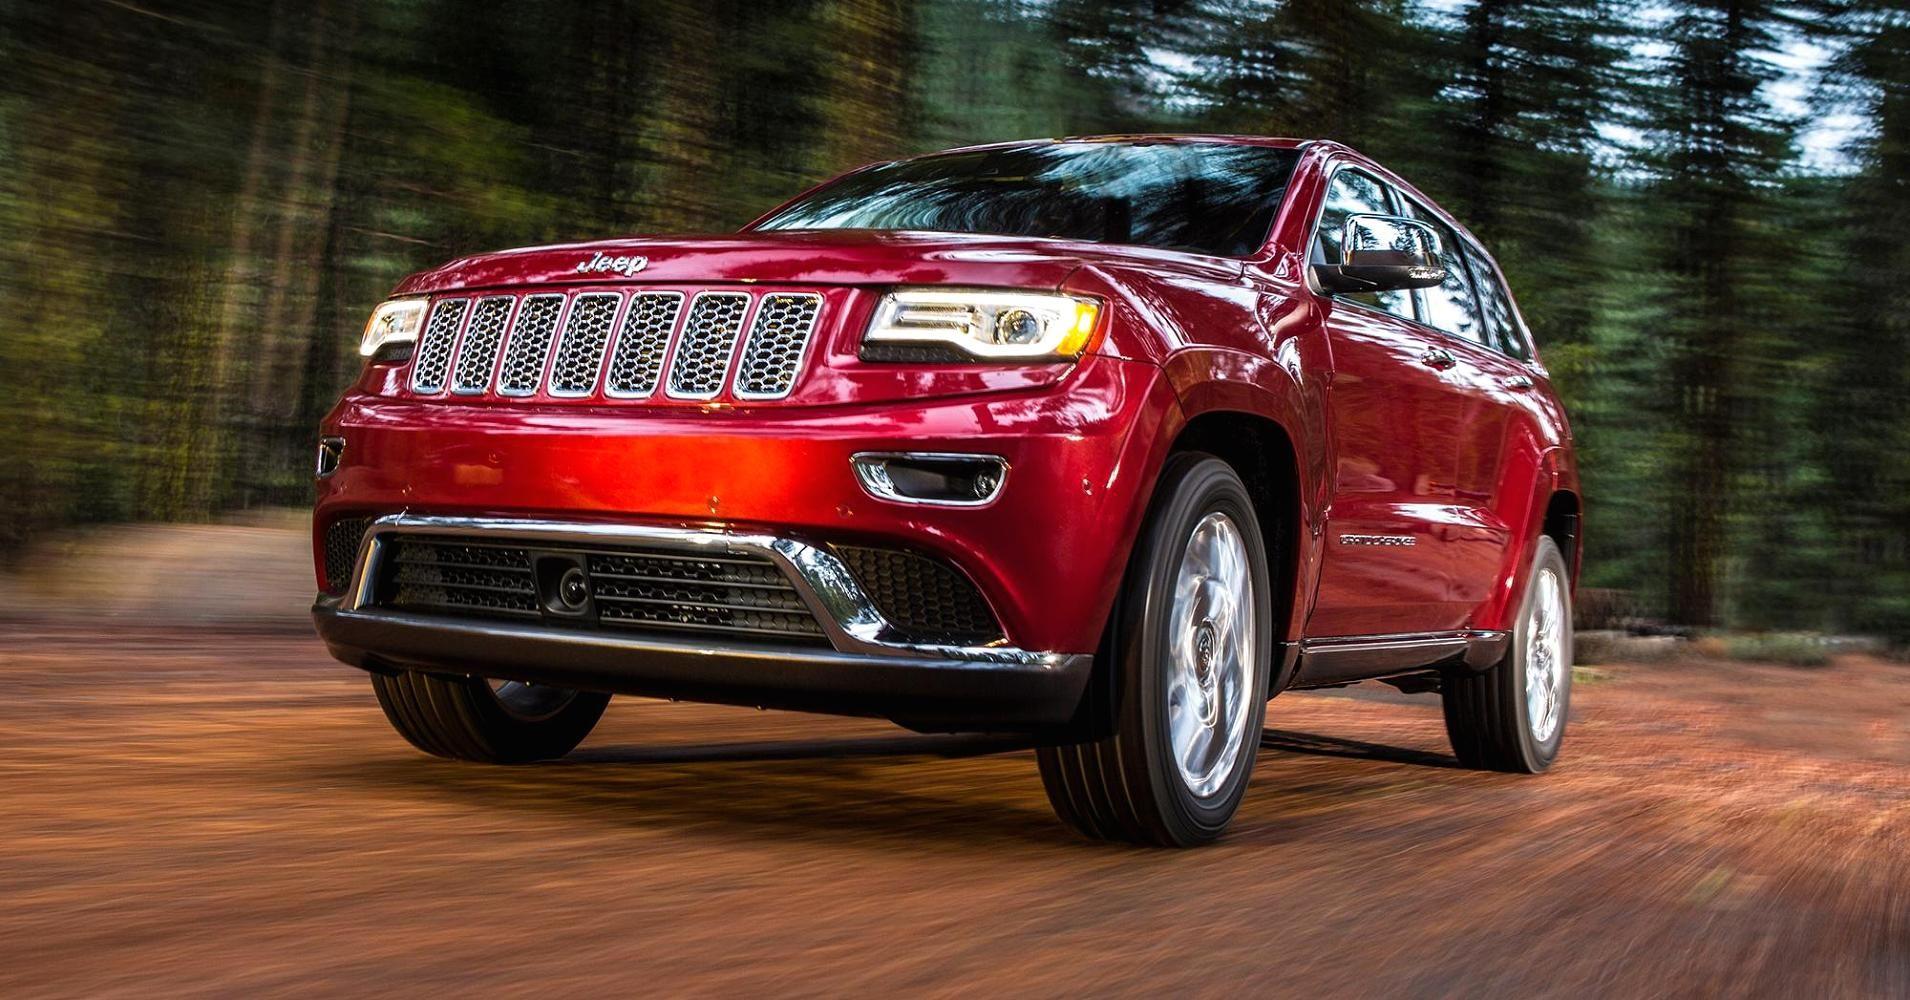 New 2019 Grand Cherokee Release Date